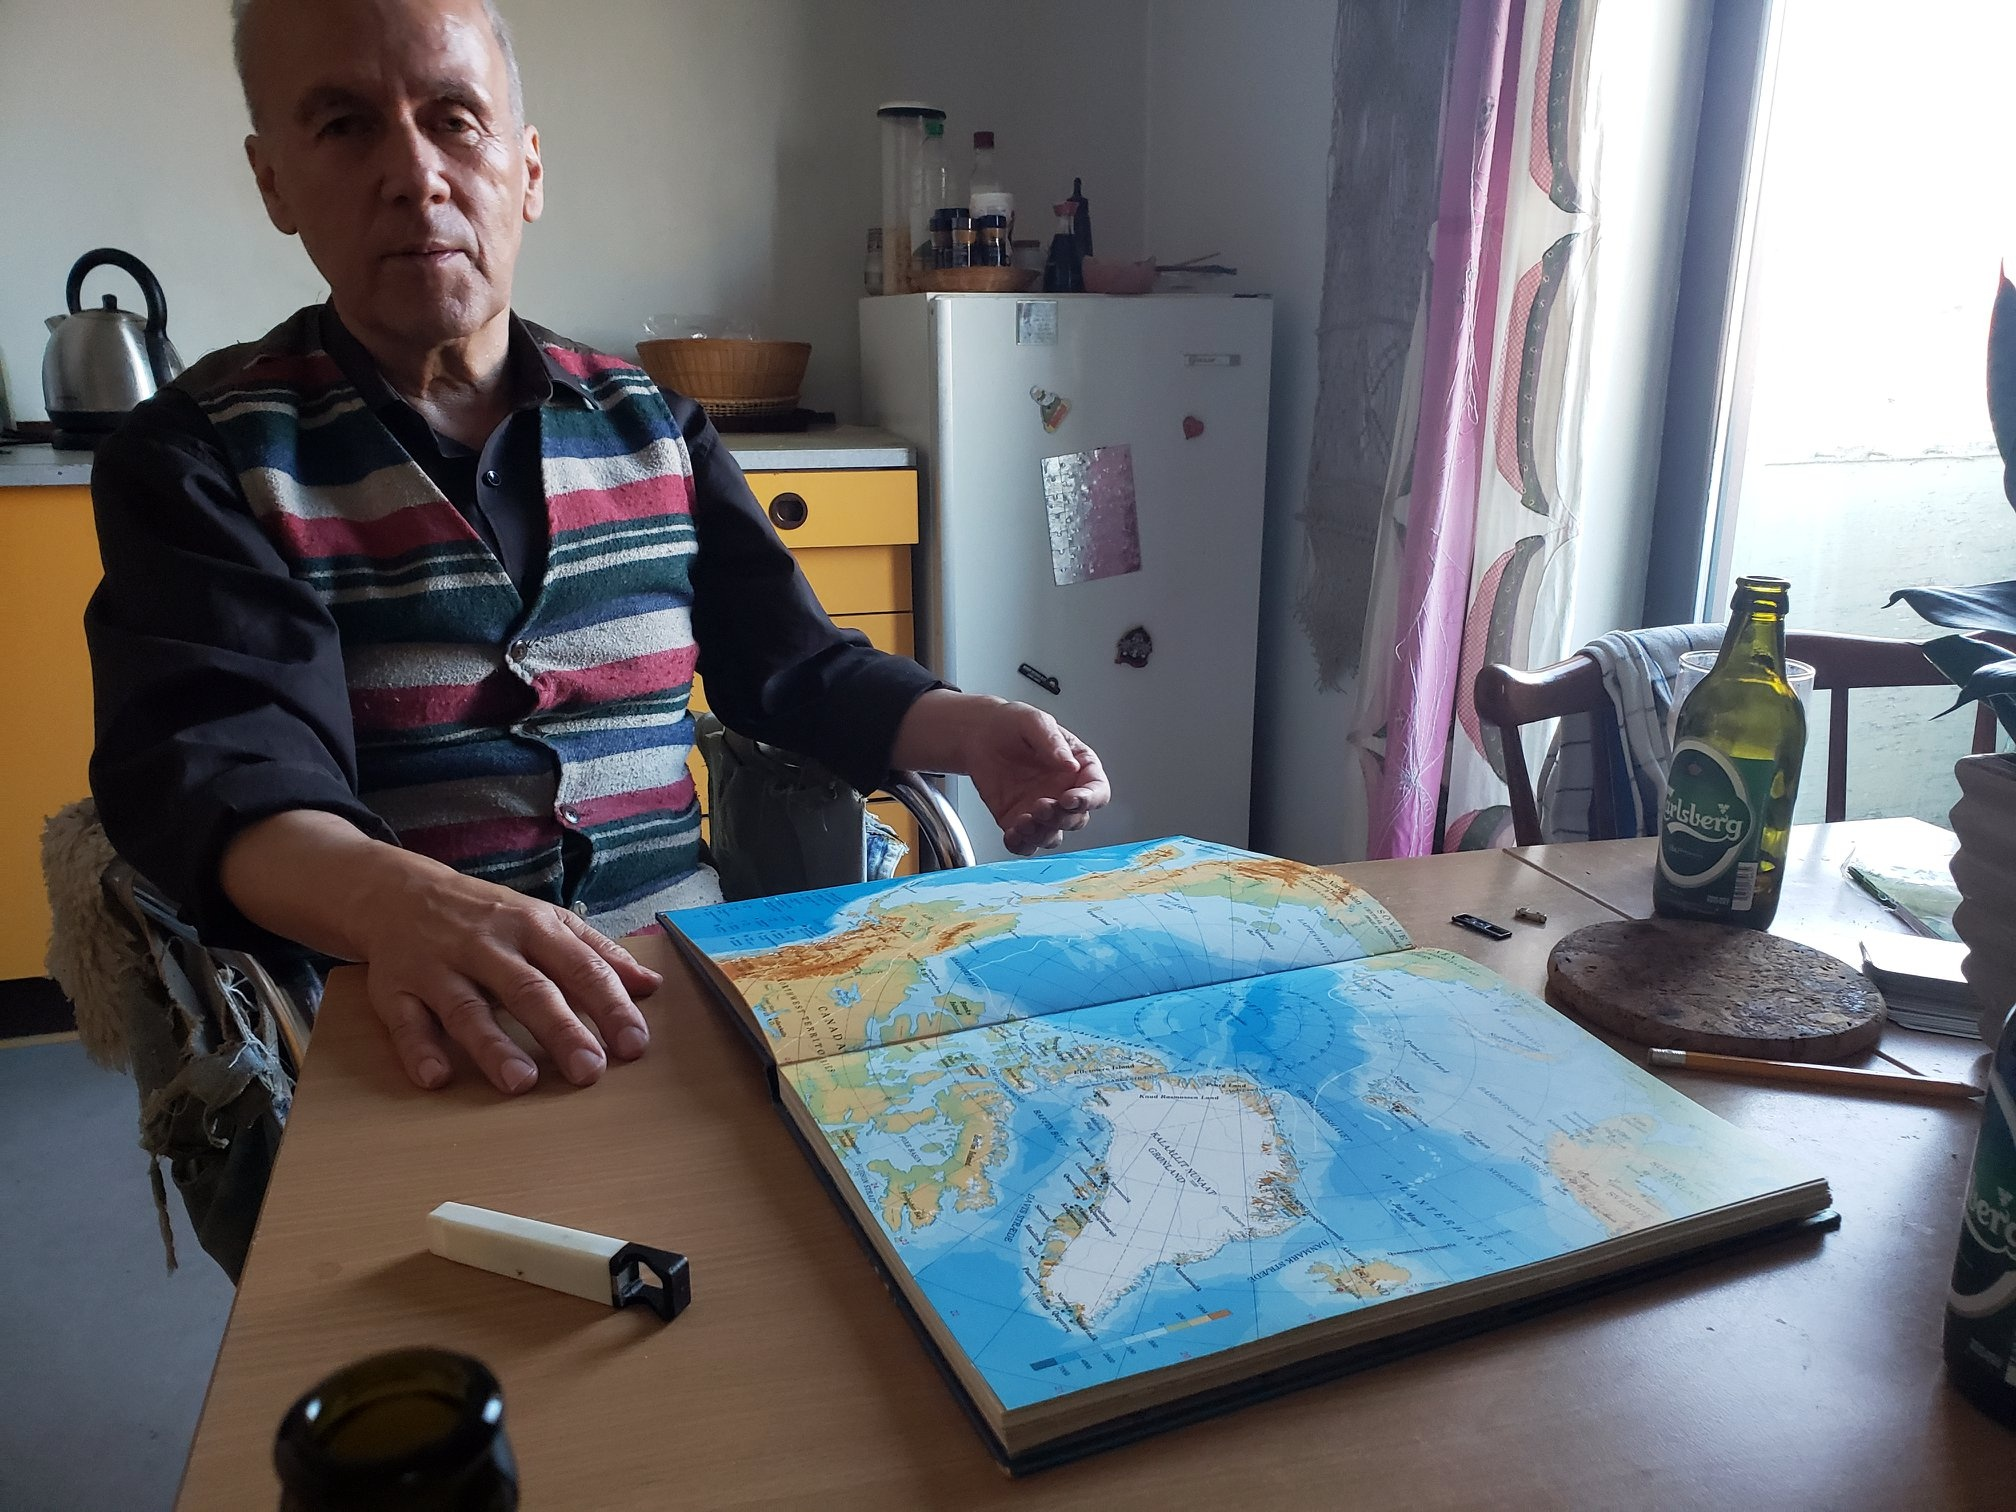 Cau chuyen Greenland va vung dat cuc Bac bi lang quen hinh anh 10